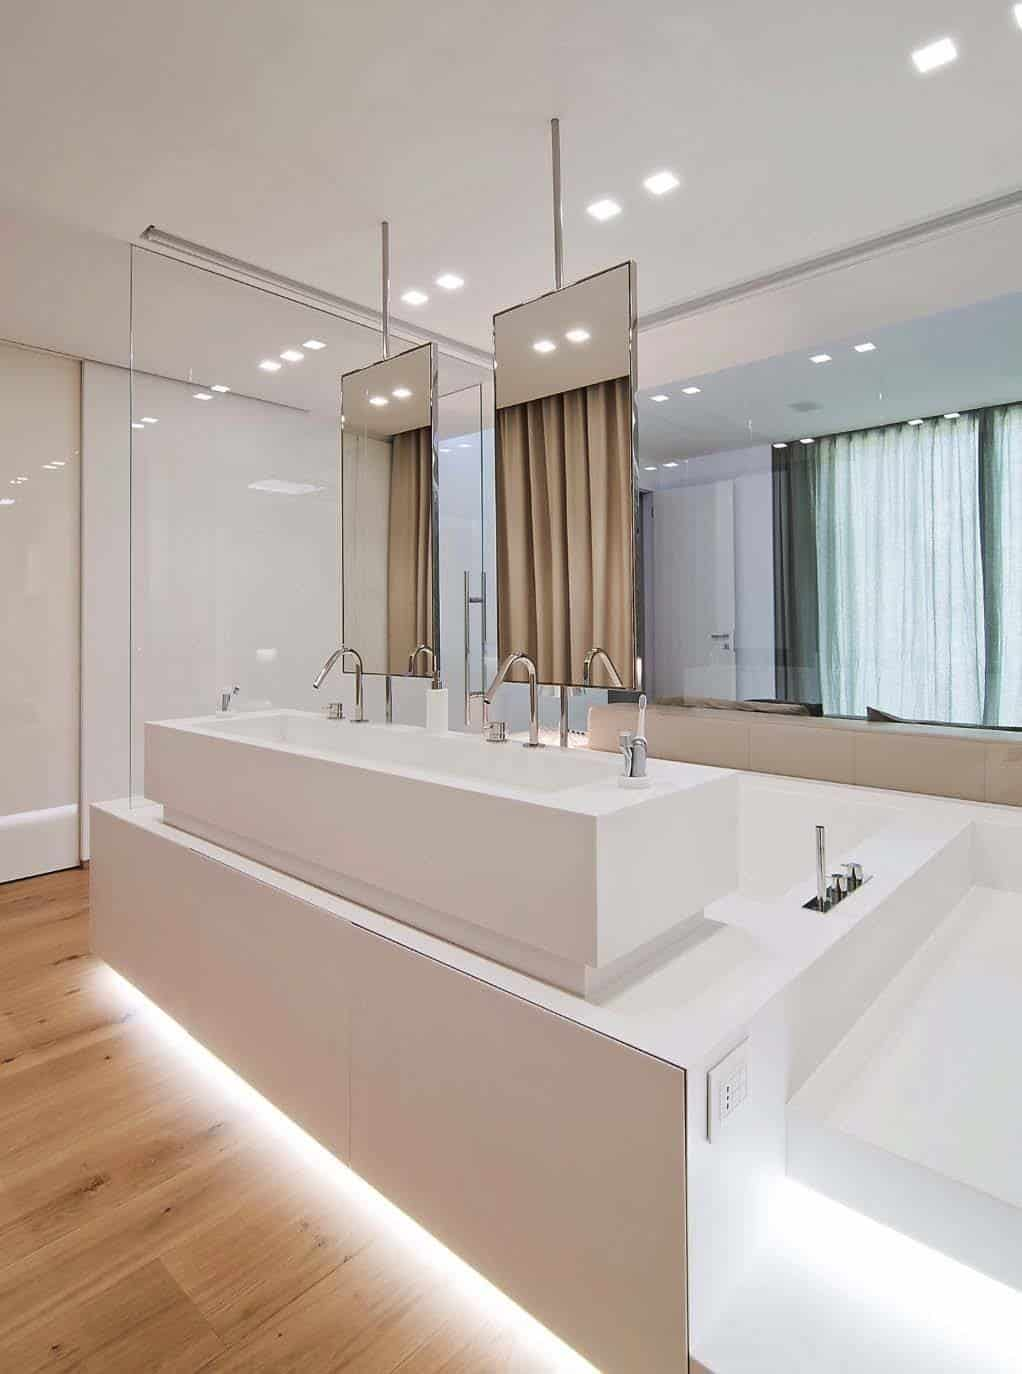 Luxury Home Interior-STIMAMIGLIO-22-1 Kindesign